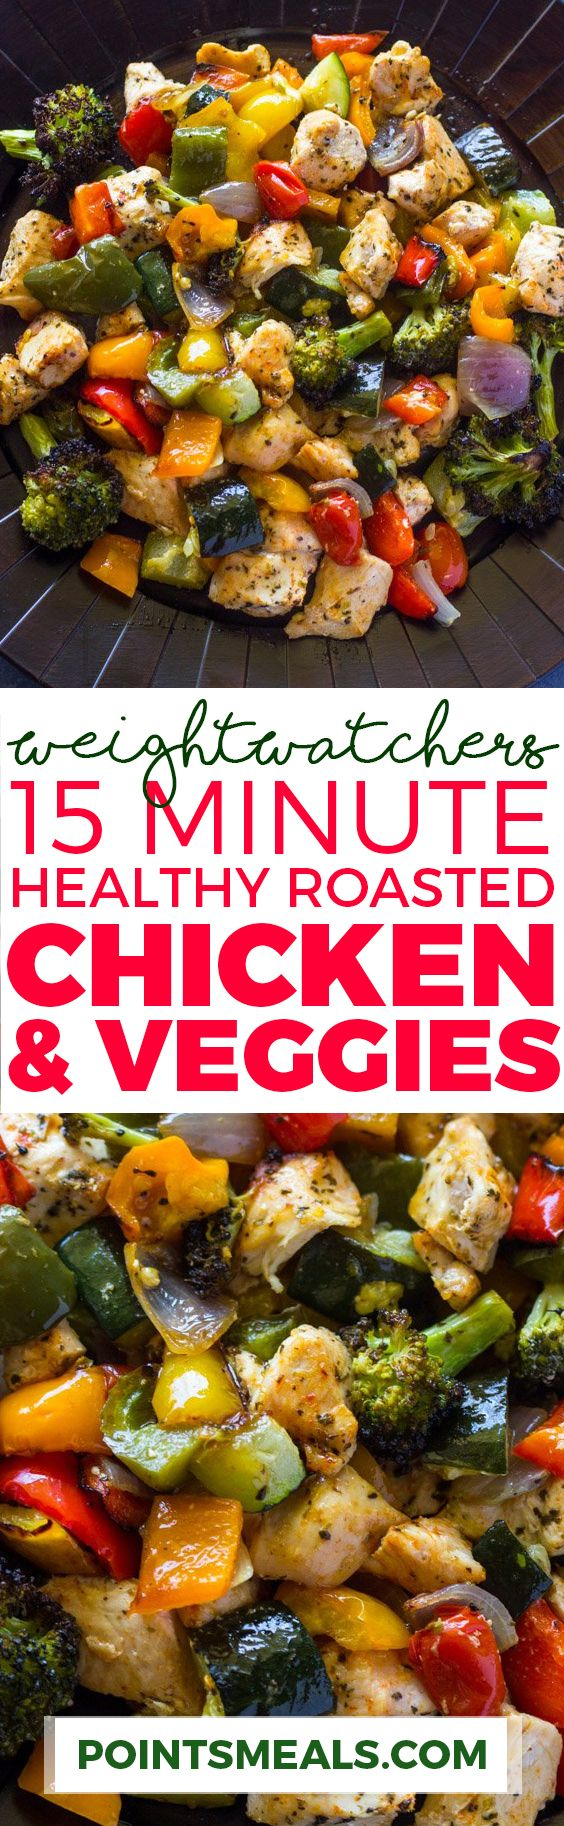 15 MINUTE HEALTHY ROASTED CHICKEN AND VEGGIES (WEIGHT WATCHERS SMARTPOINTS)